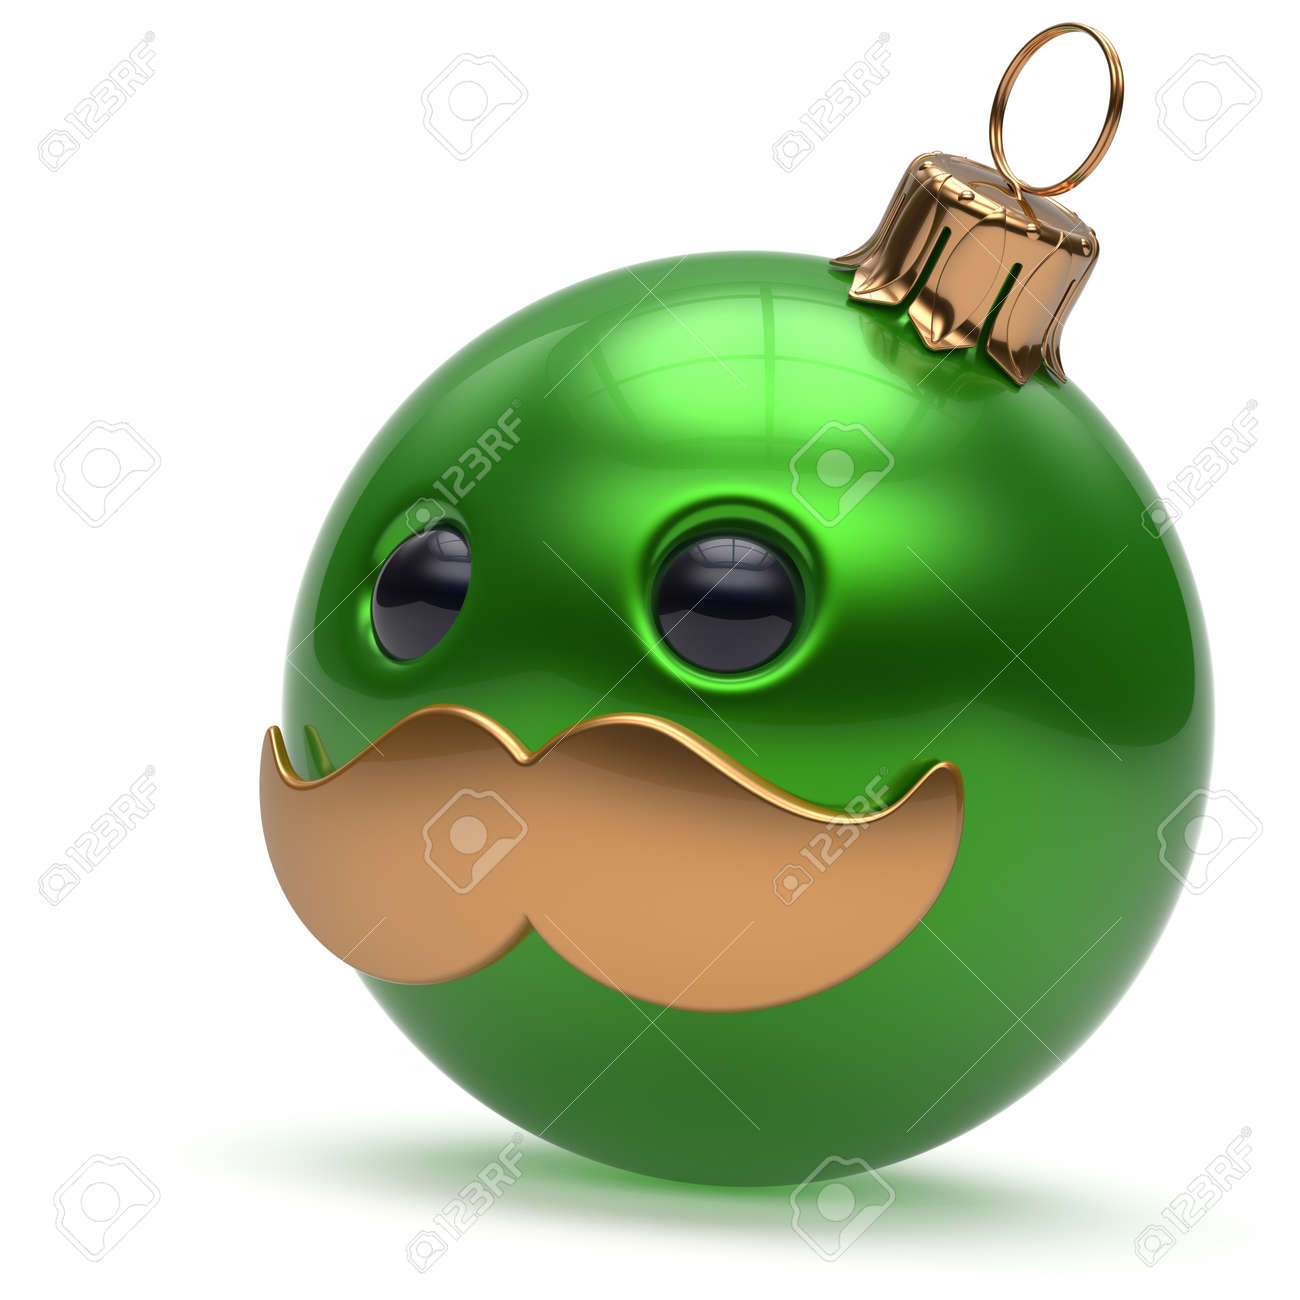 Lustige Weihnachtskugeln.Stock Photo